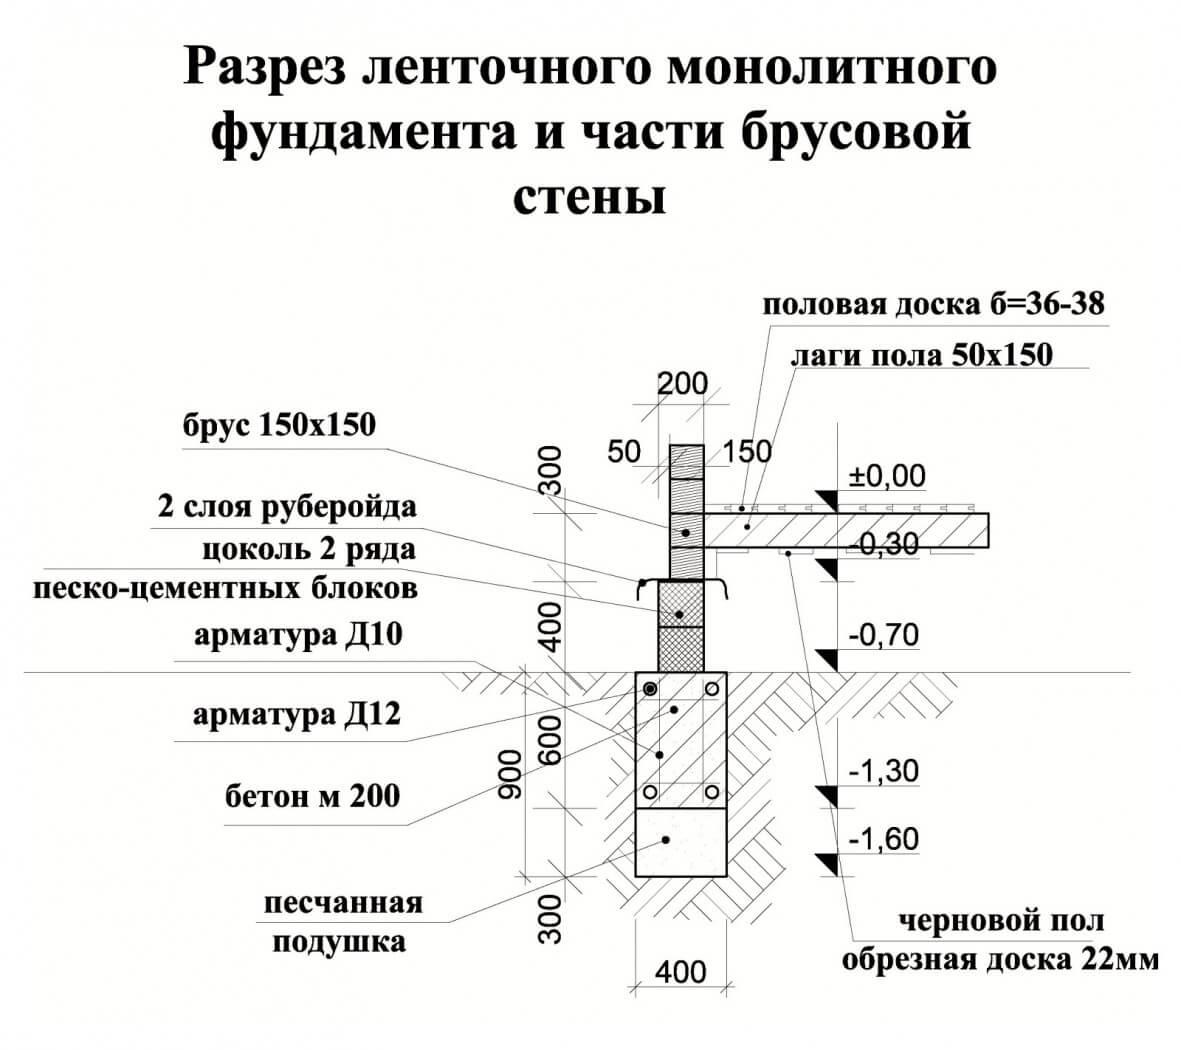 Строительство монолитного фундамента: технология, ремонт, видео